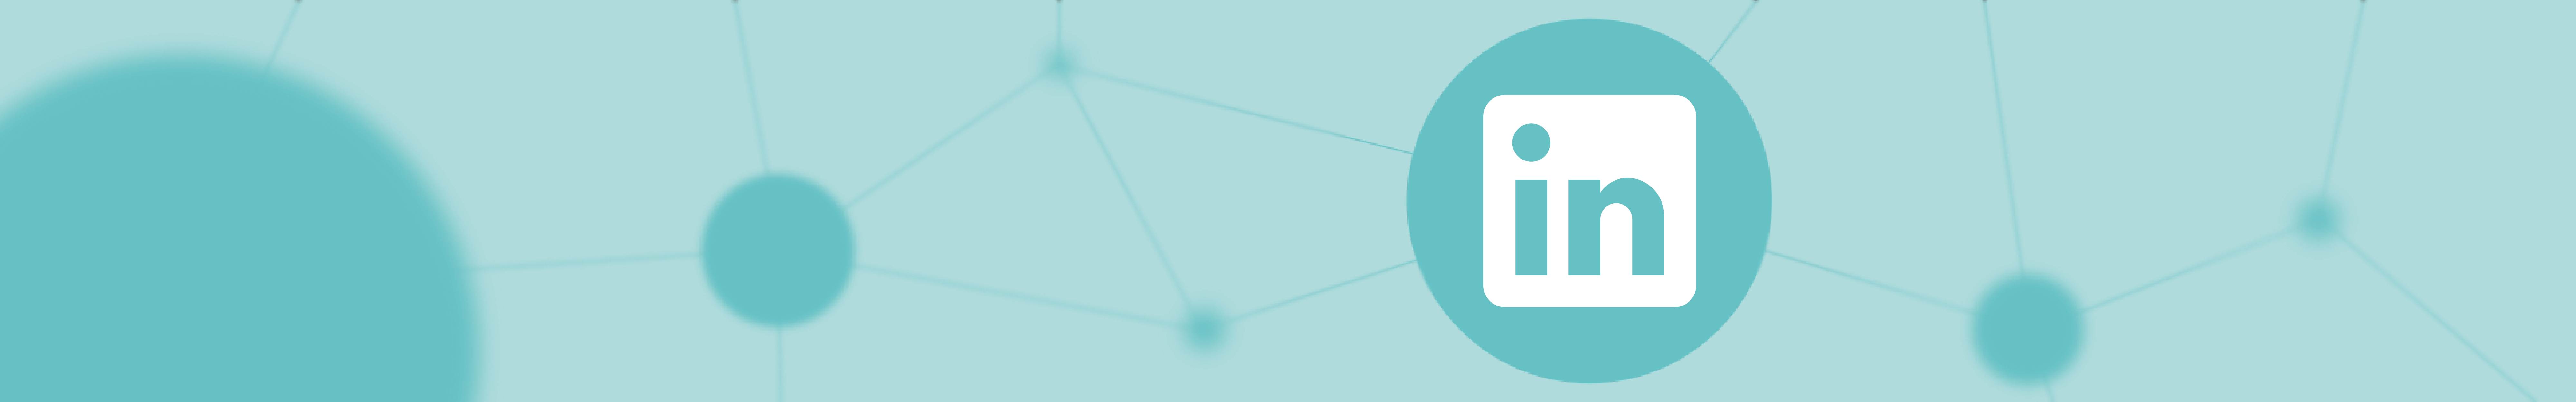 10 REASONS WHY: LinkedIn als relevanter Kanal im Social Media Marketing Mix